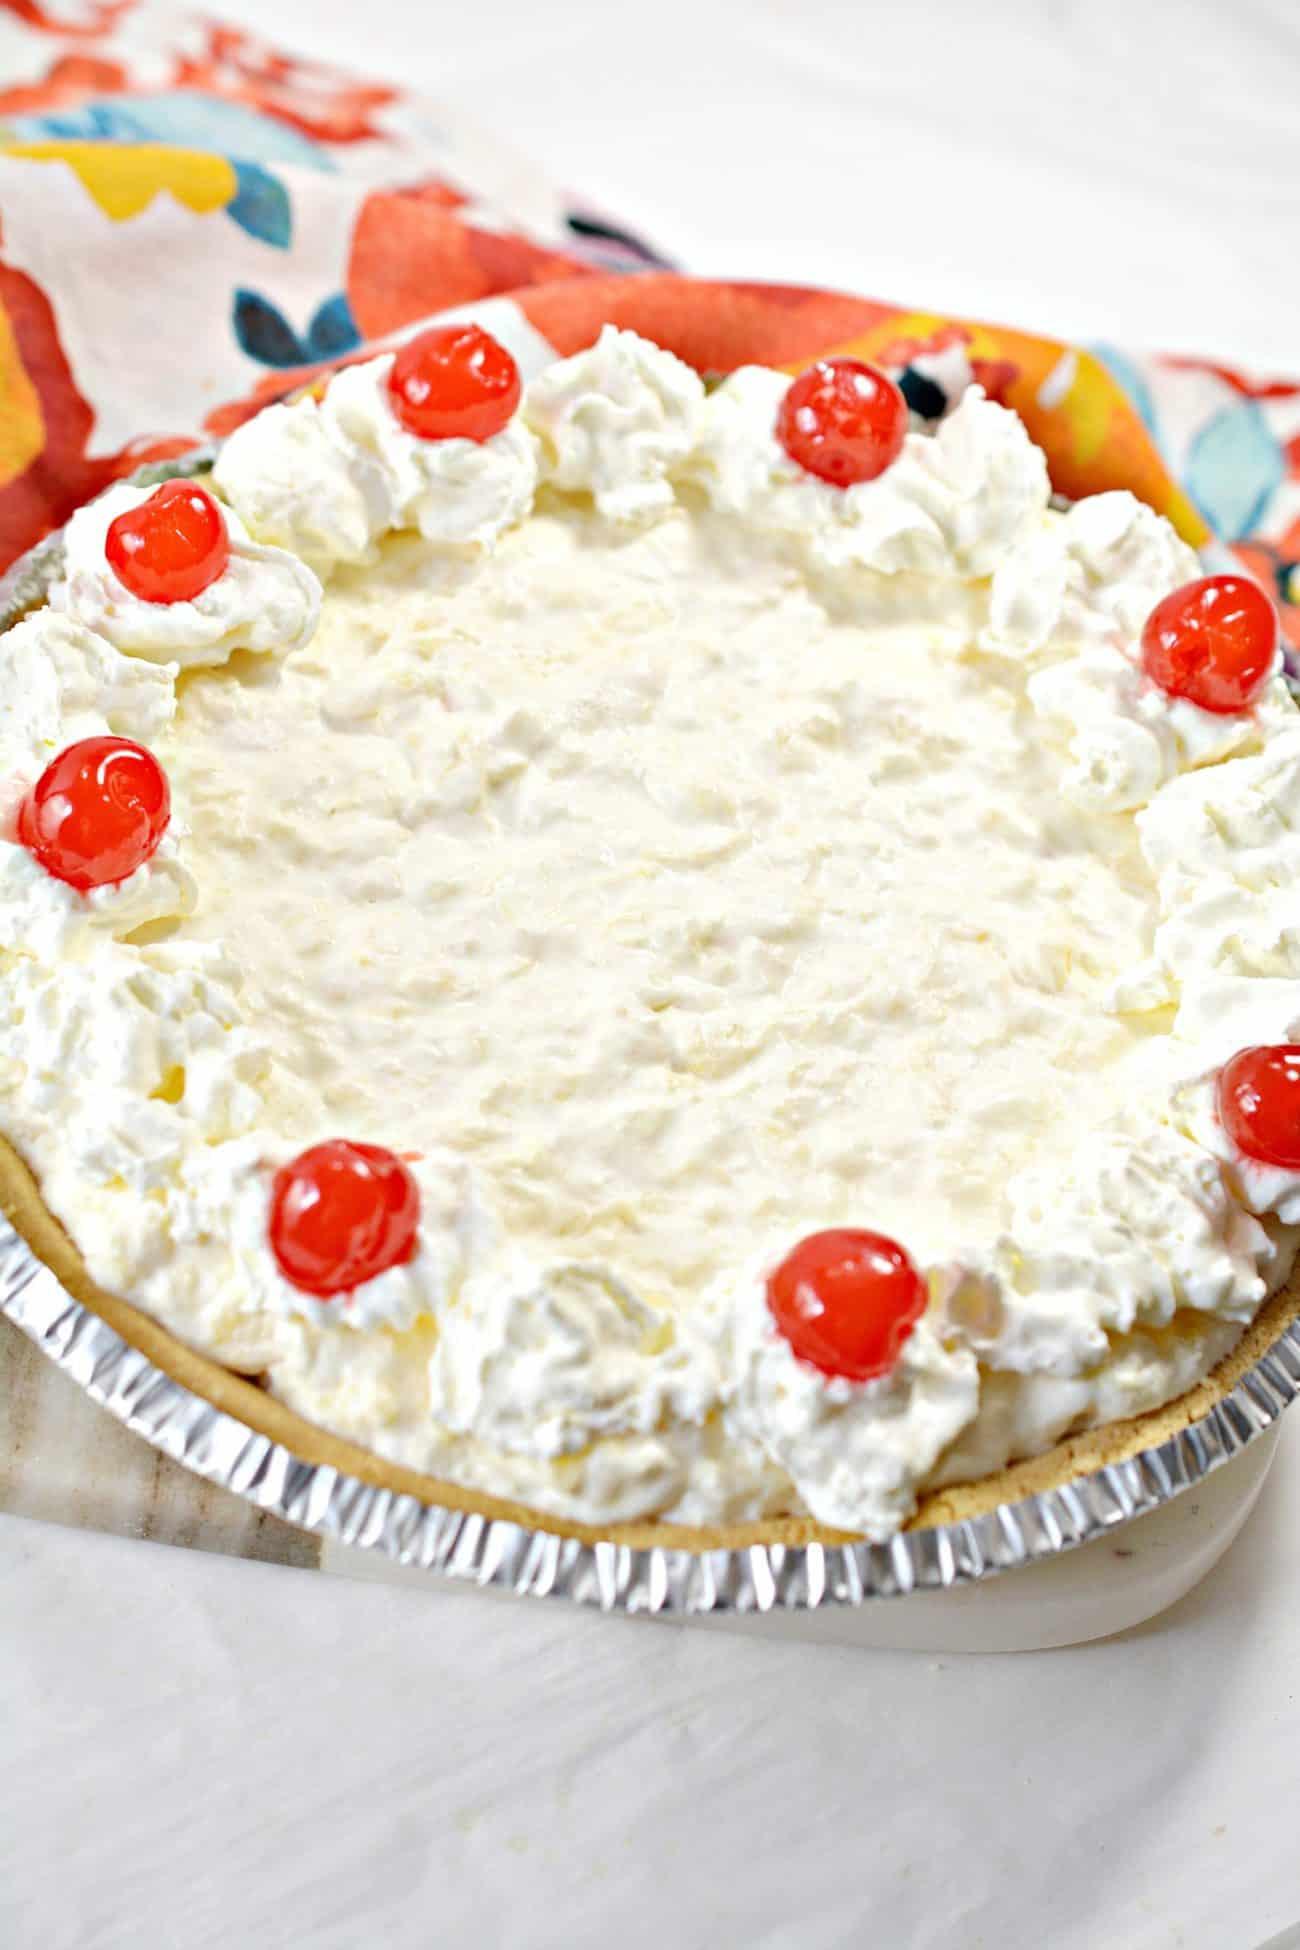 Creamy Pineapple Cheesecake